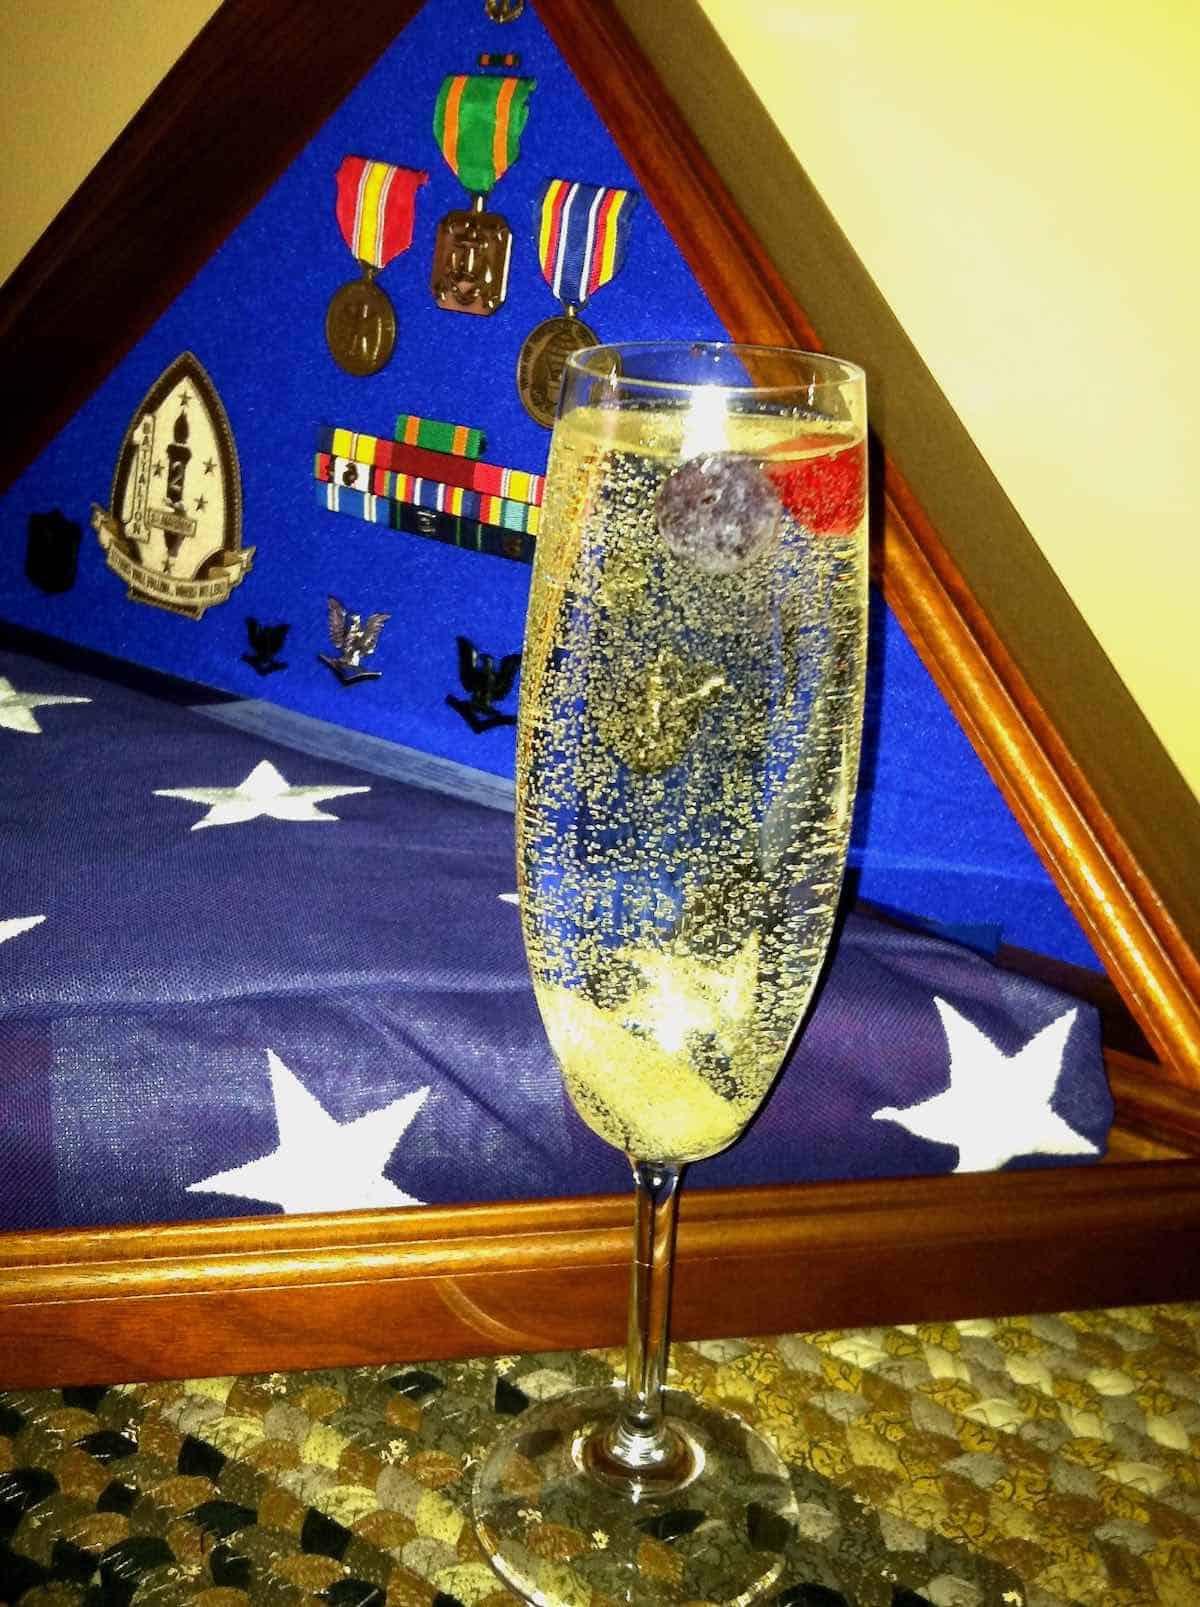 Sweet William's Spirited Sparkler to toast a festive celebration